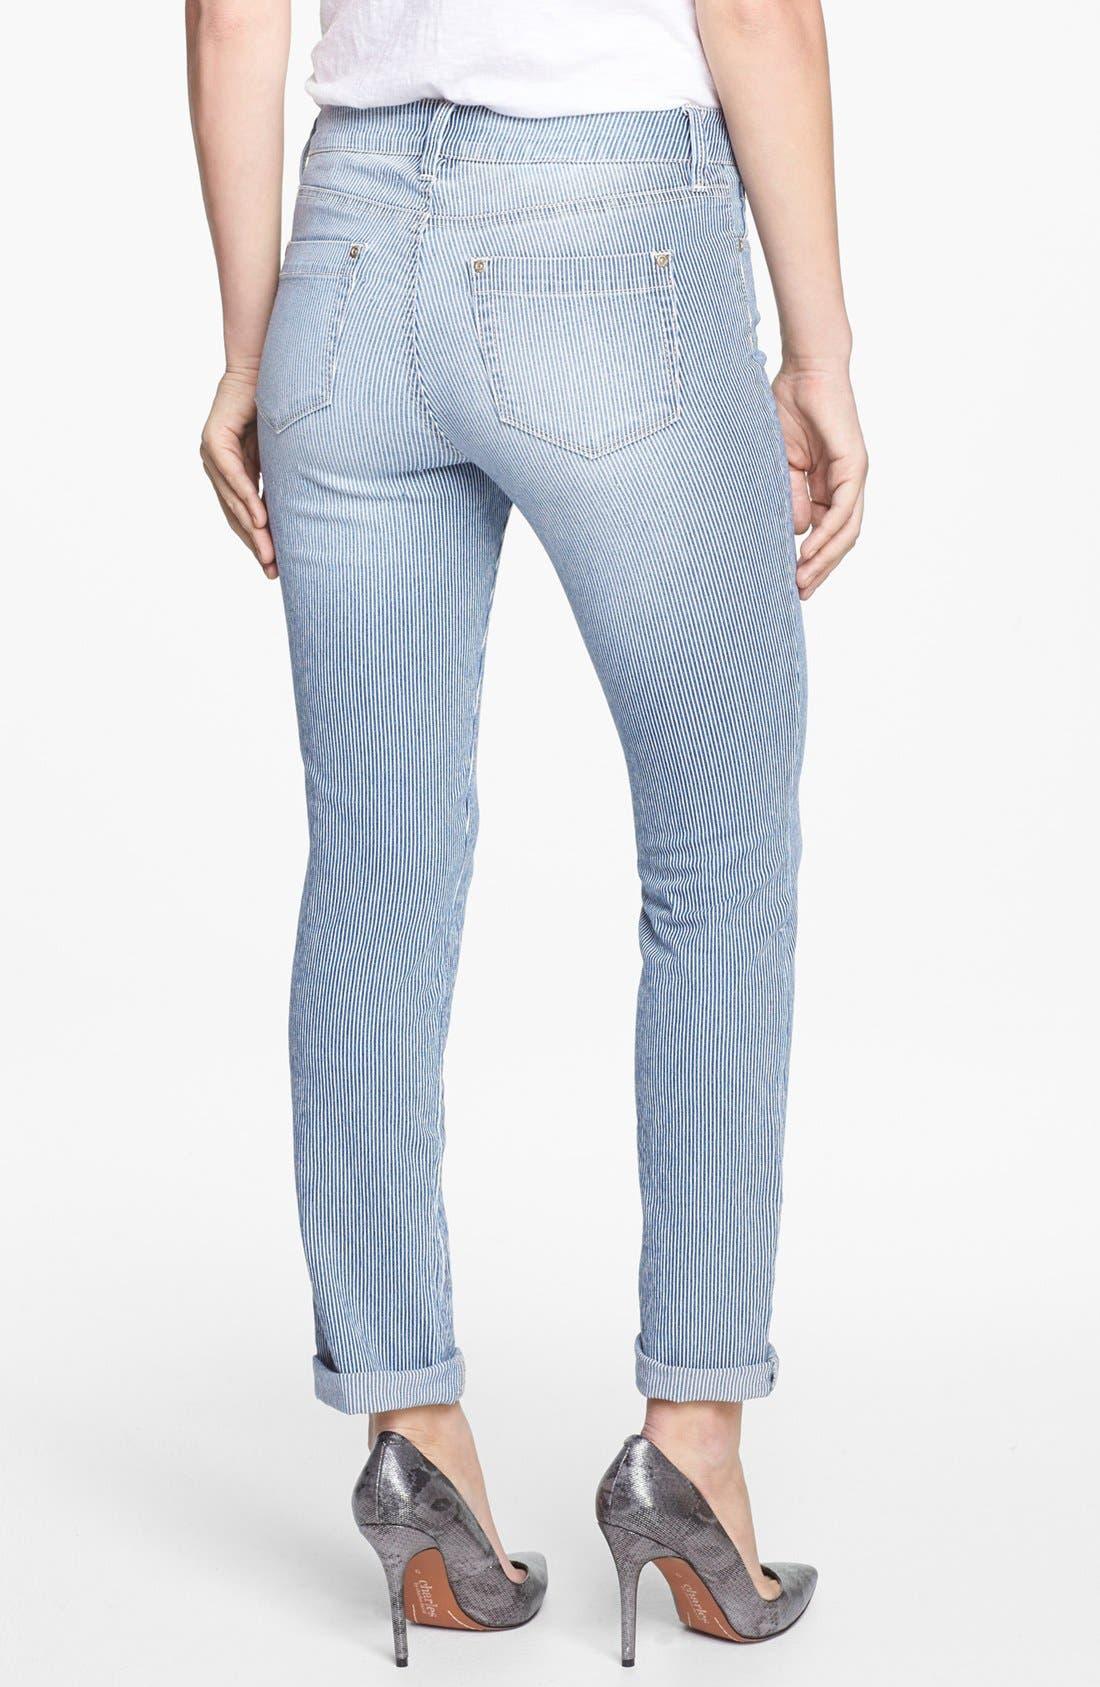 Alternate Image 2  - NYDJ 'Leann' Stretch Skinny Boyfriend Jeans (Old West Stripe) (Petite)